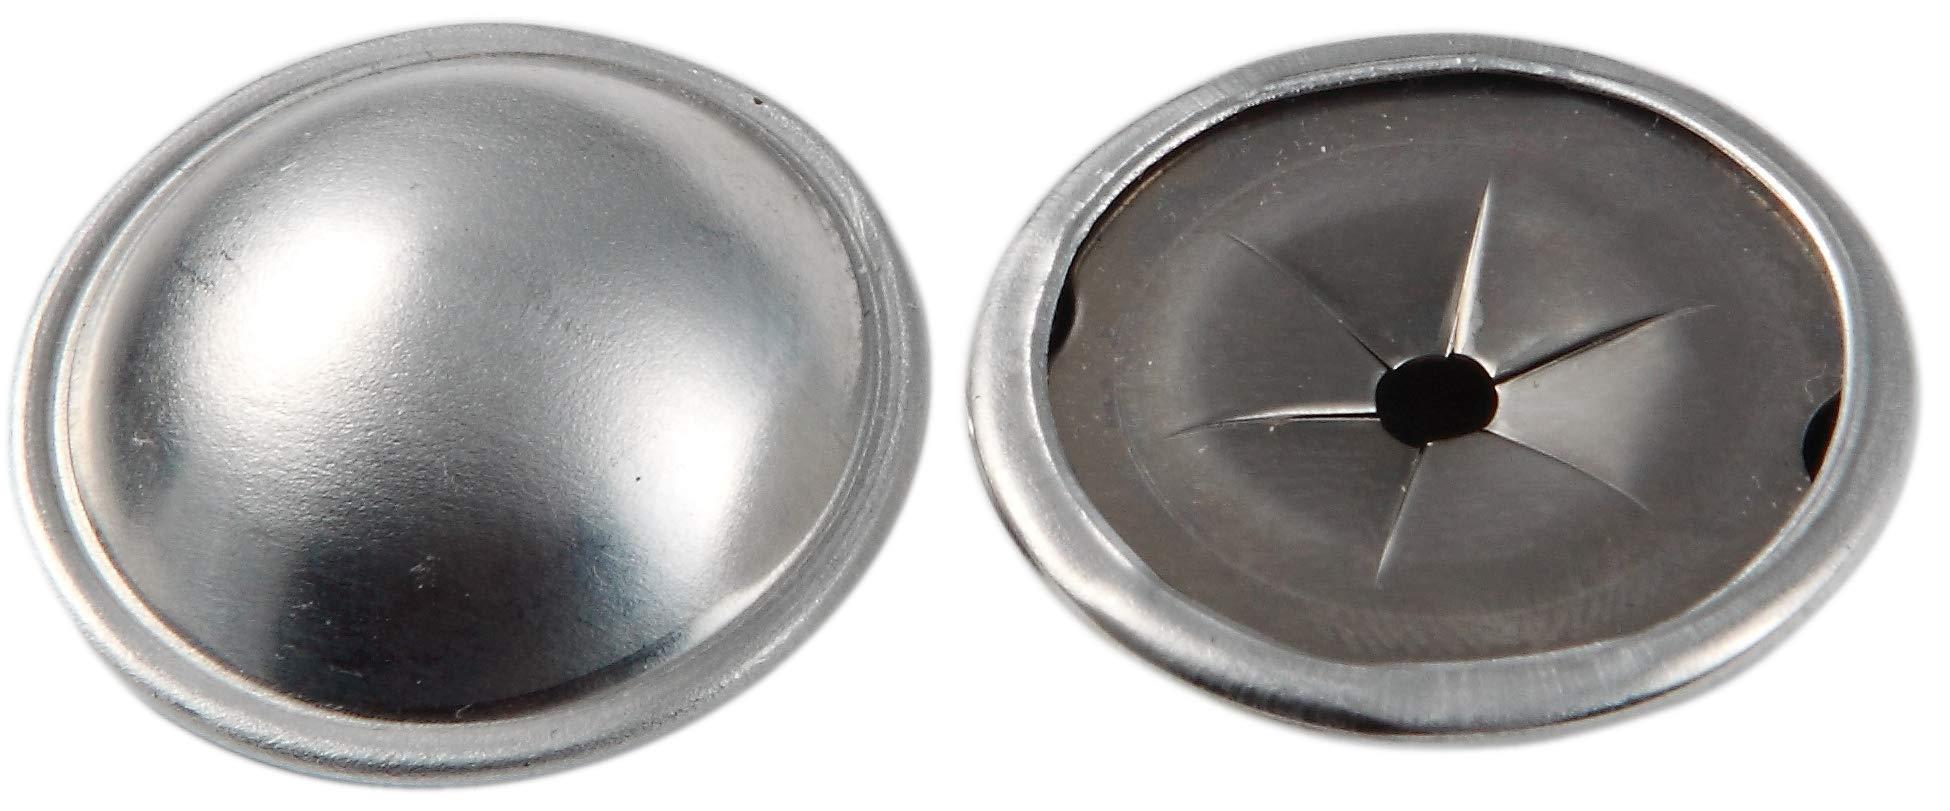 Insulation Dome Cap Washers (100, Aluminum)